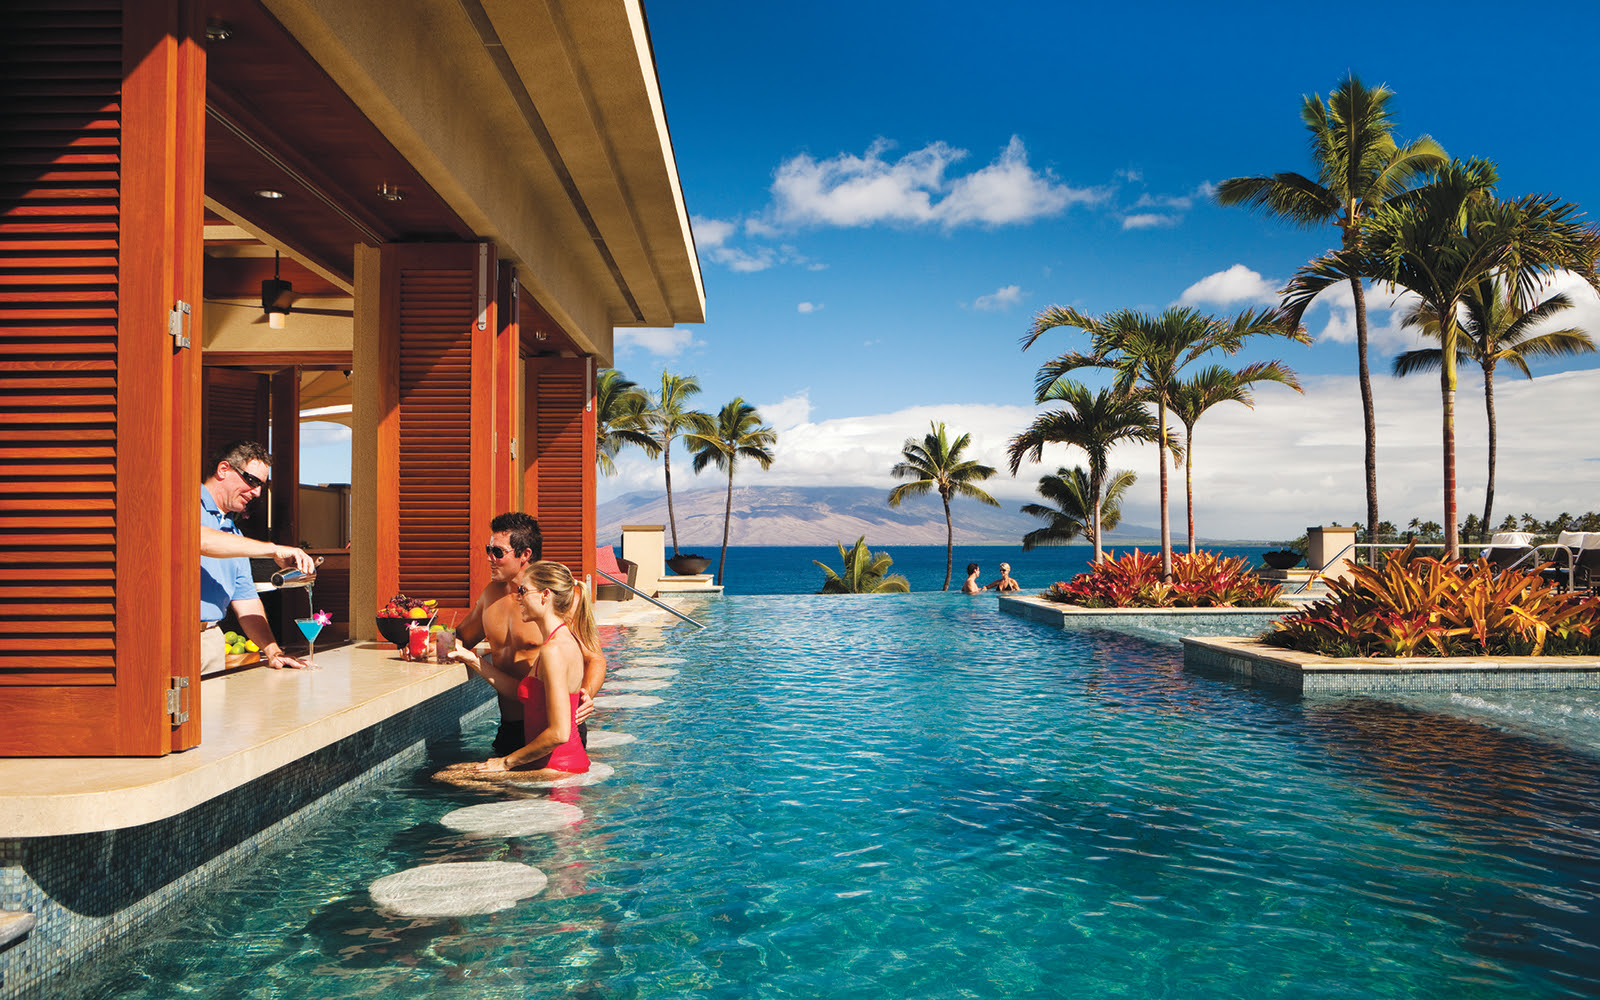 Maui Hawaii The Favorite Island For Hollywood